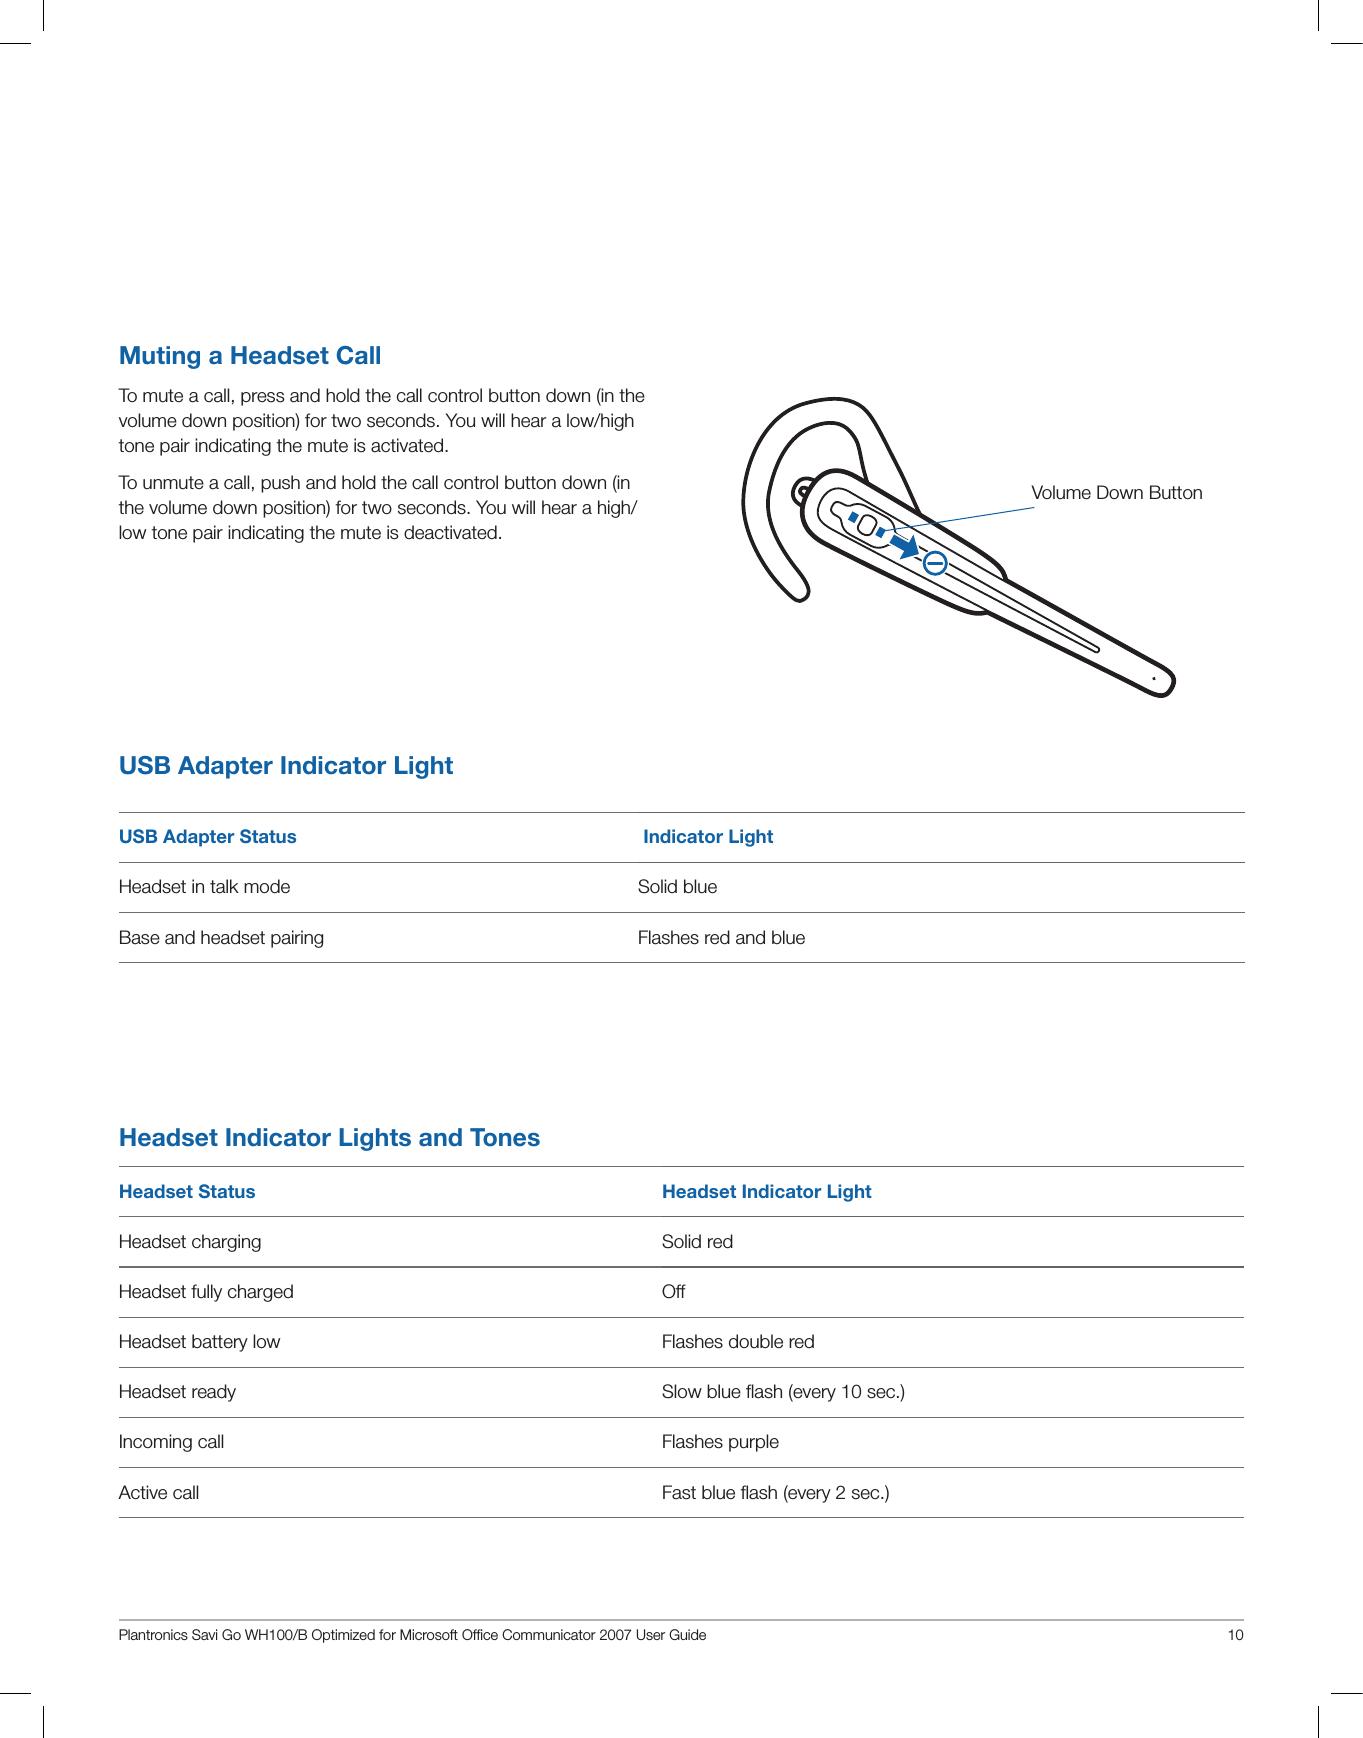 plantronics s12 headset instruction manual